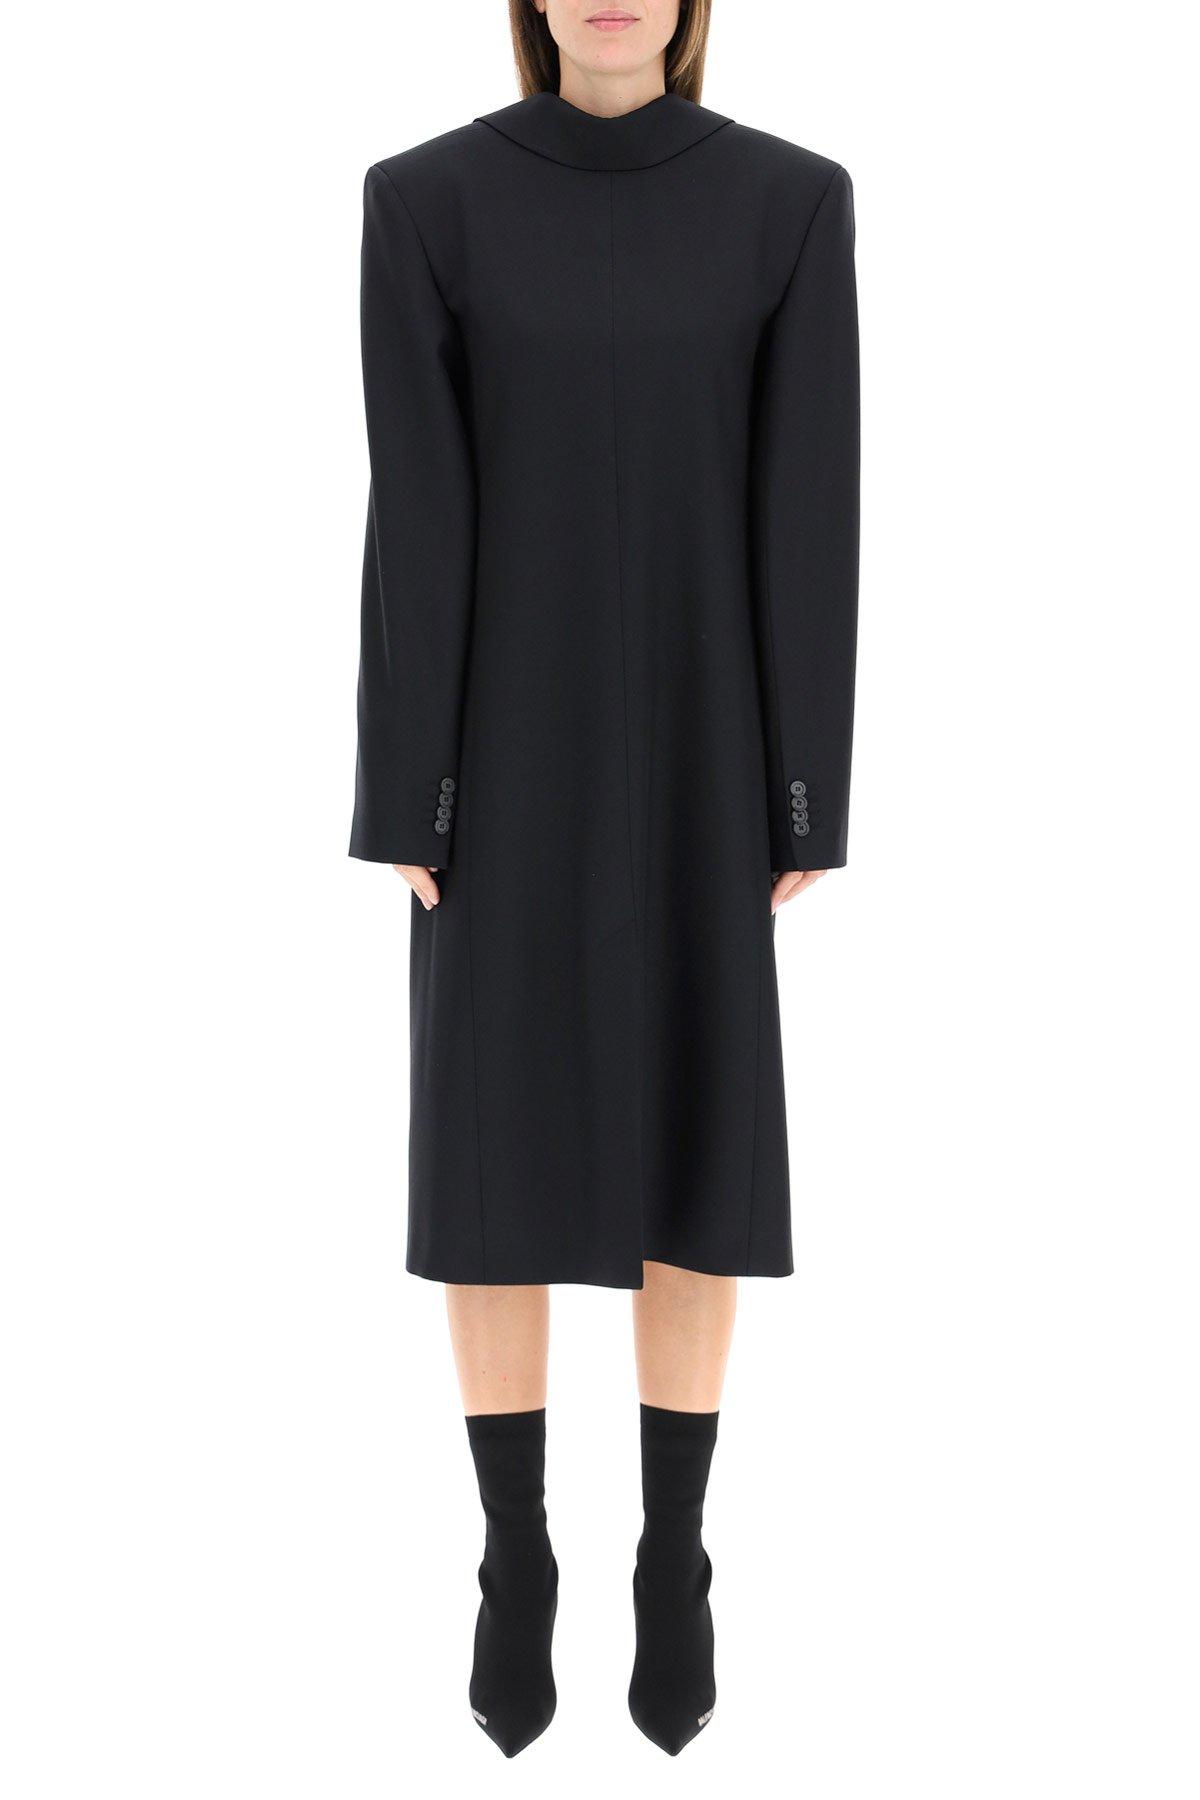 Balenciaga abito back to front